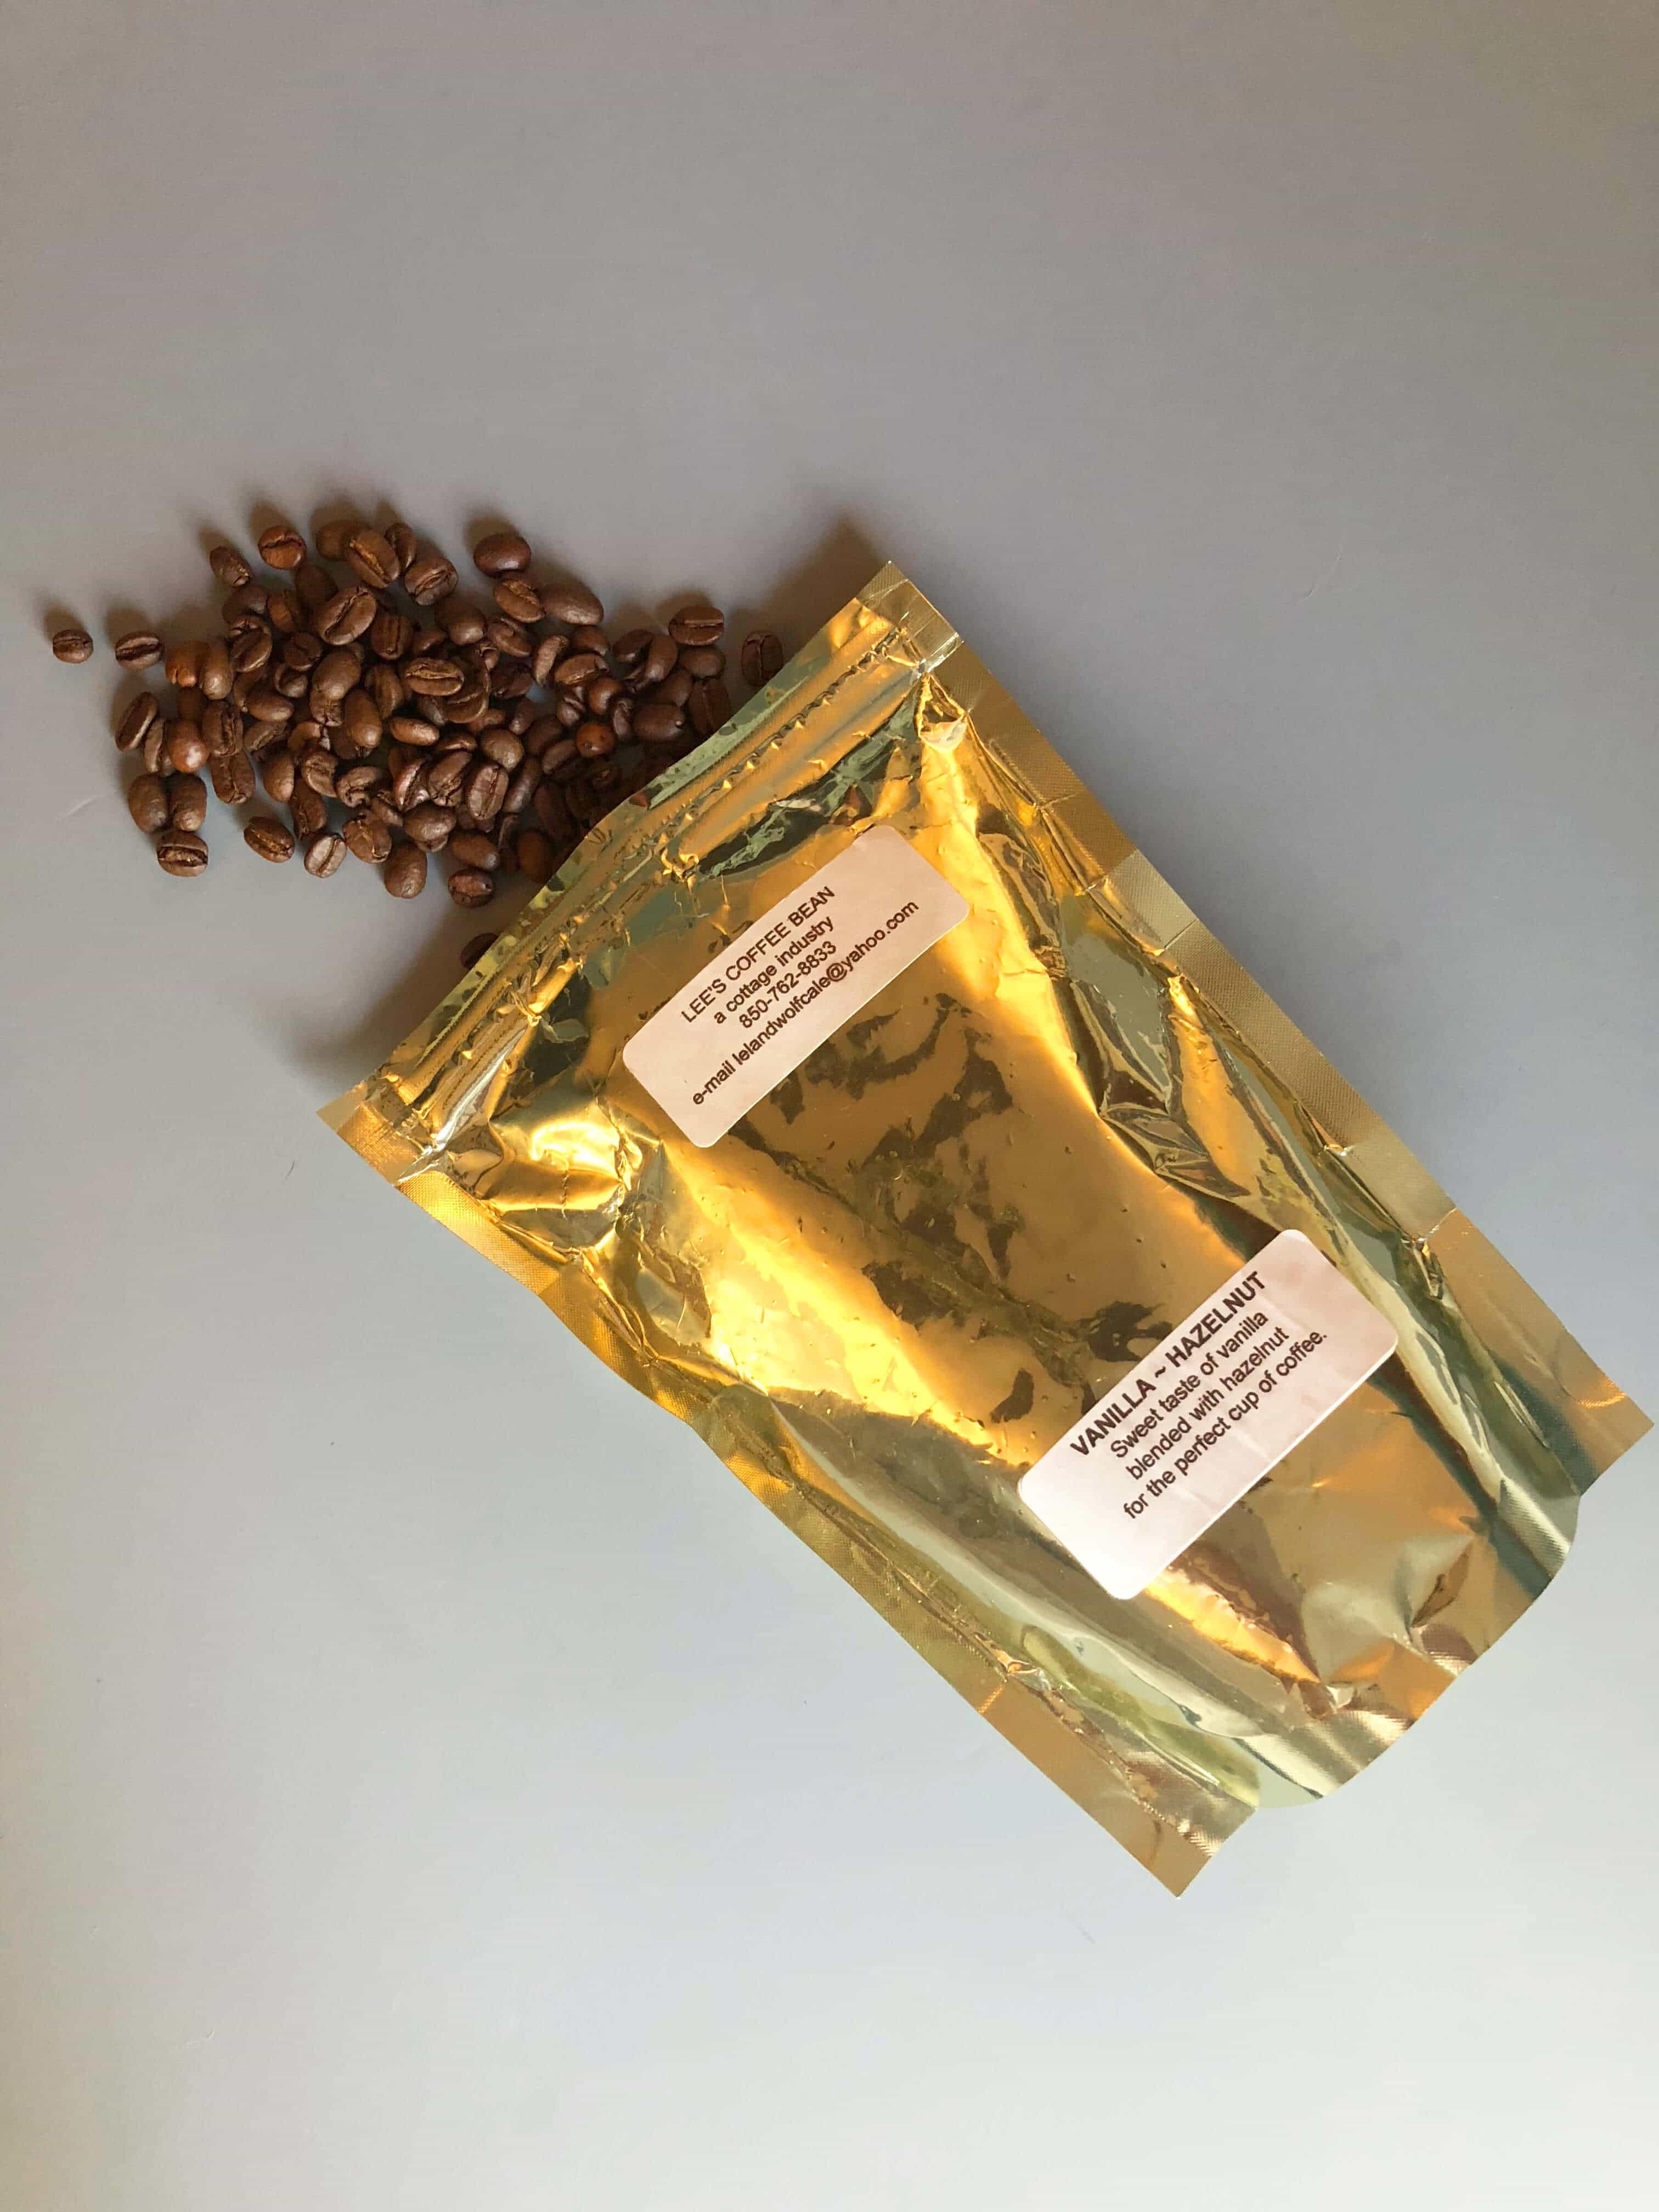 A Recap of My October Favorites #saveeandsavory #octoberfavorites #beauty #wellness #coffee